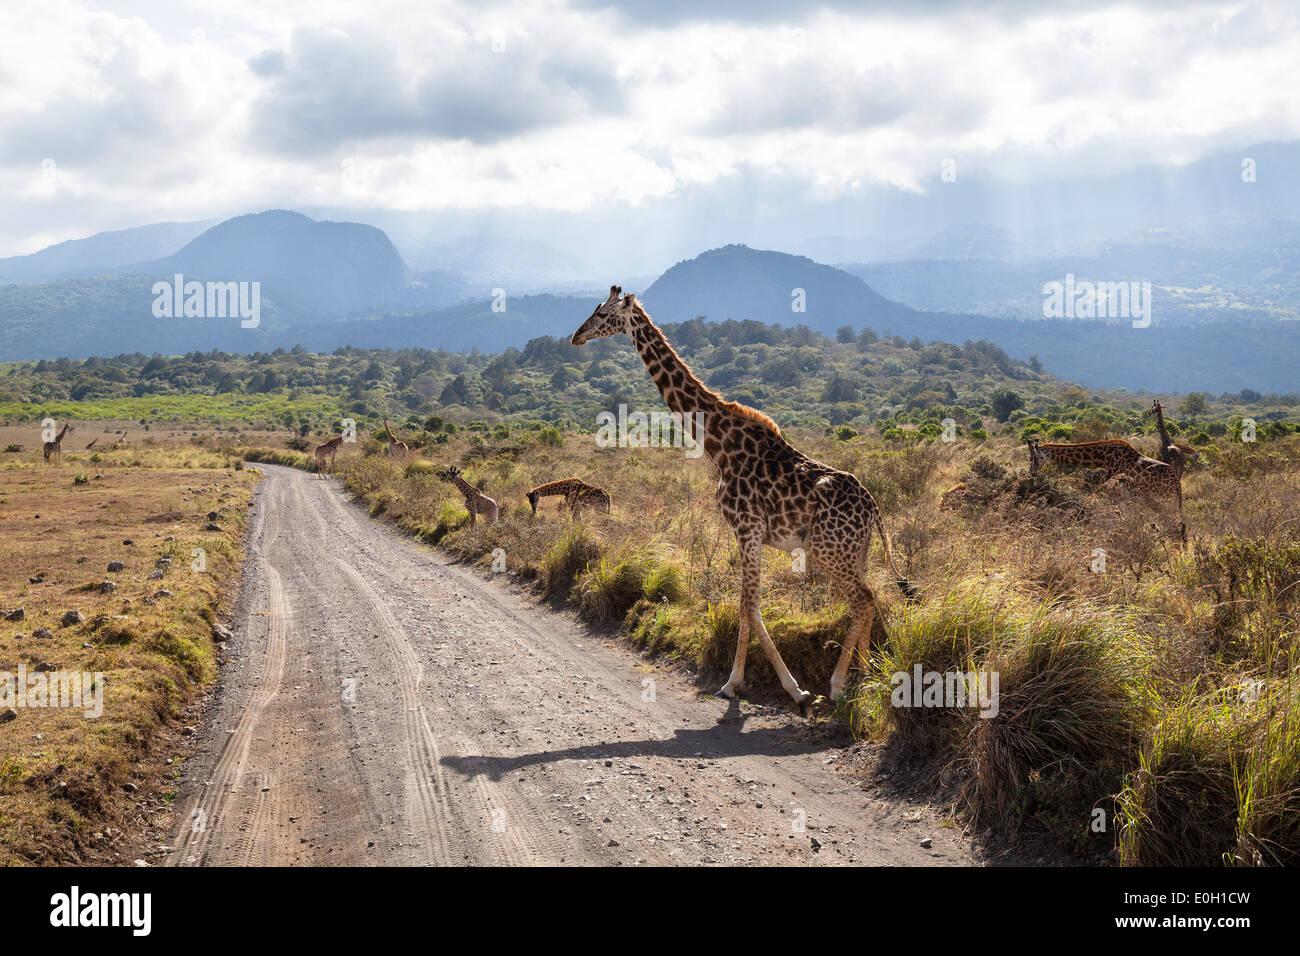 Massai giraffa attraversando la strada, Giraffa camelopardalis, Mount Meru, Parco Nazionale di Arusha, Tanzania, Africa orientale, Africa Immagini Stock